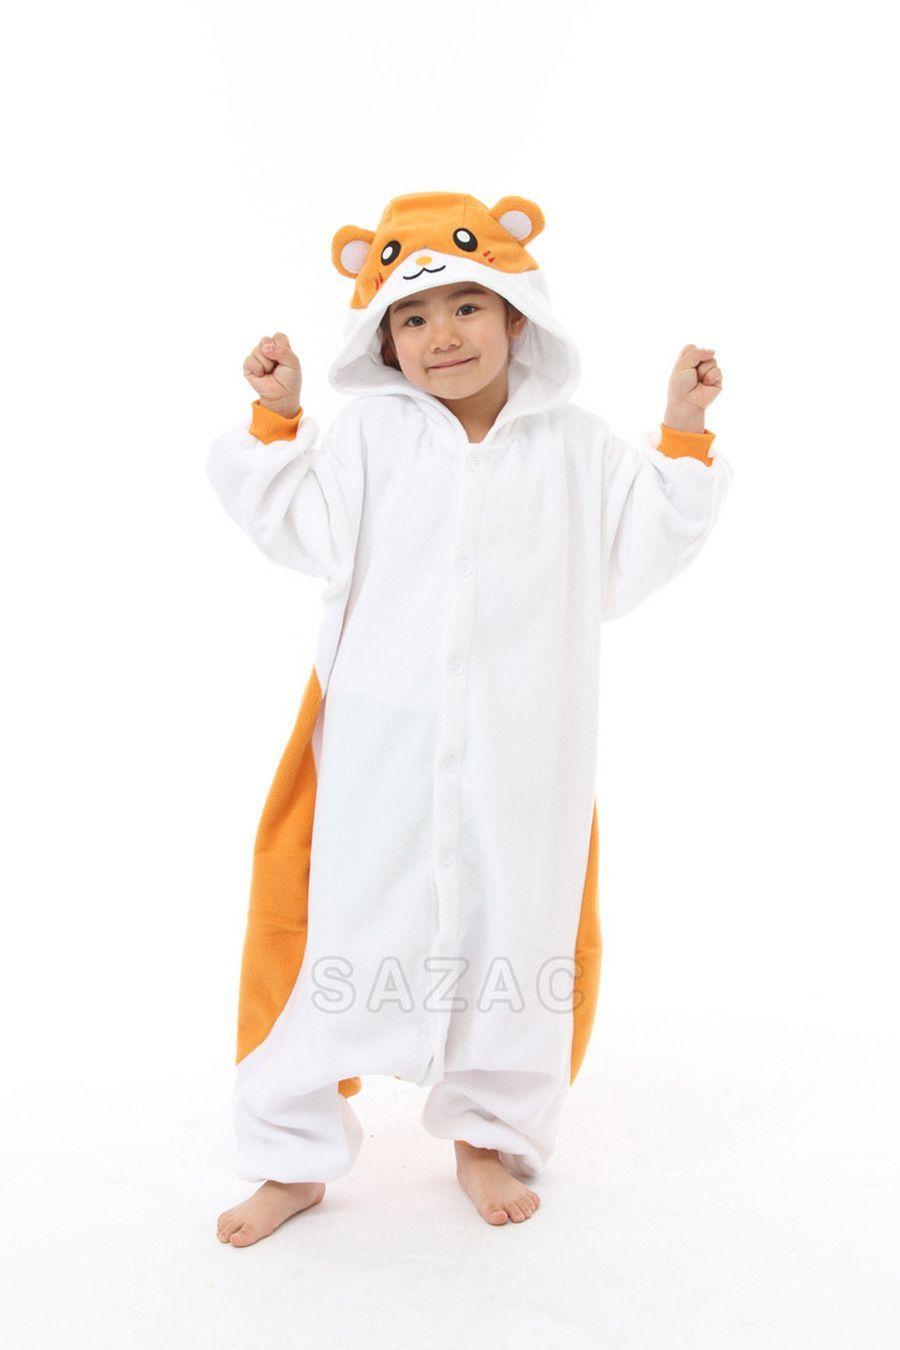 a5c86d9ccf89 Kids Hamster Kigurumi Onesie